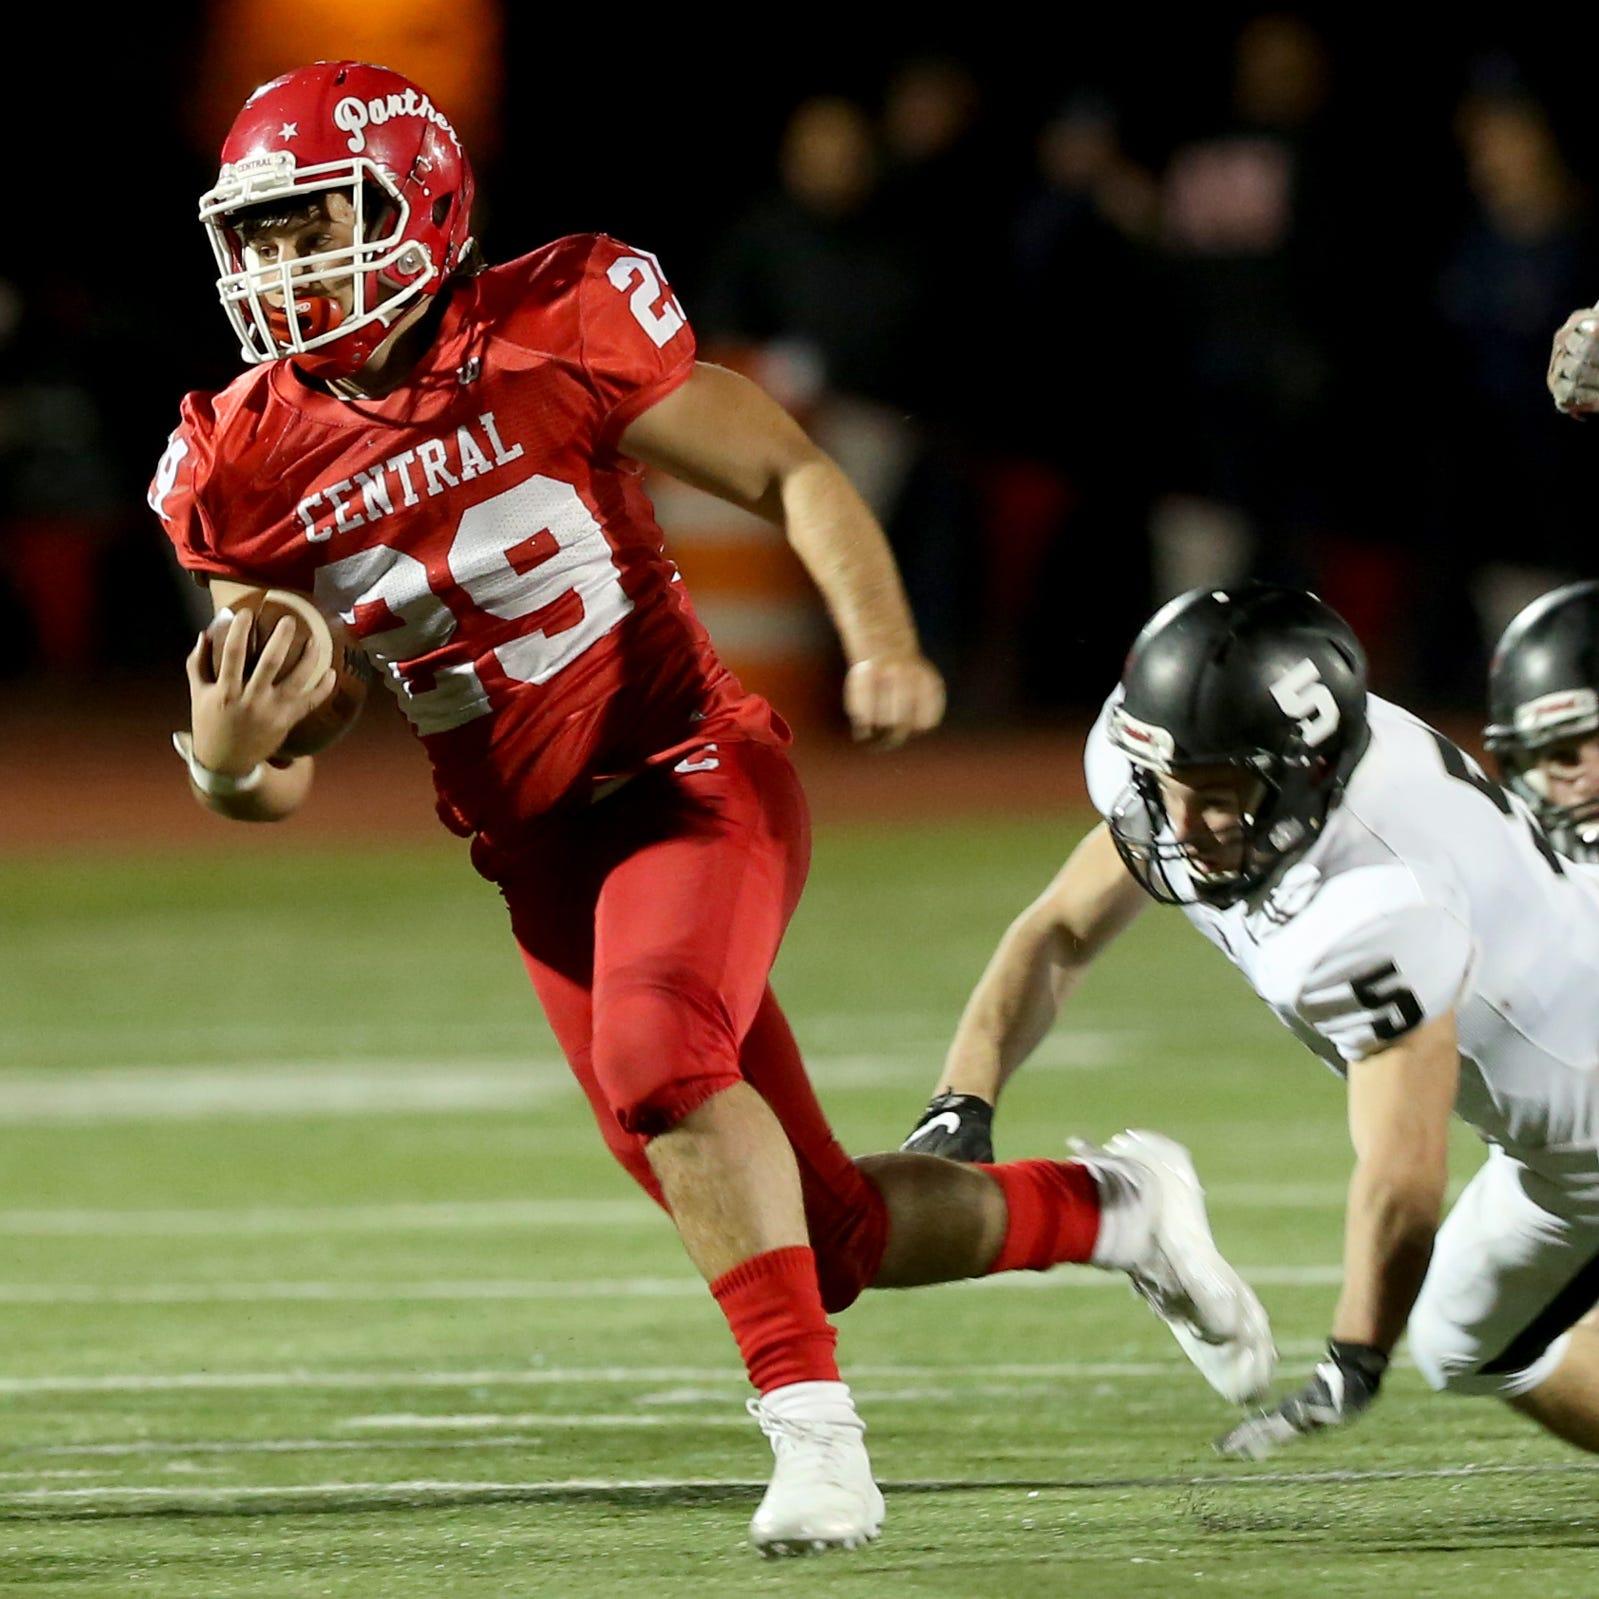 Salem-area high school football standings after Oct. 12 games